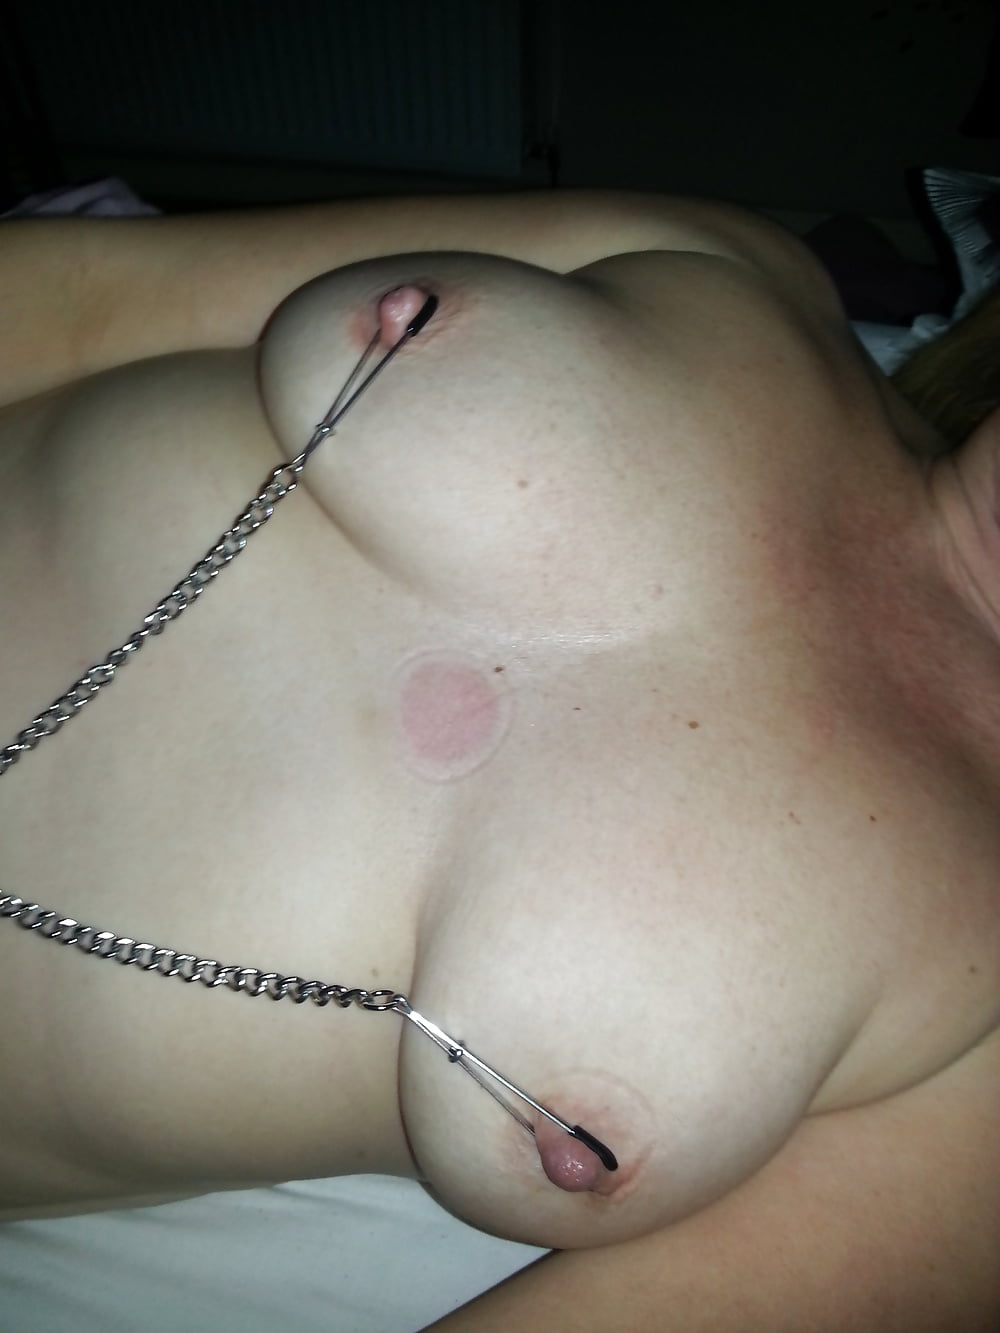 Tit on clit